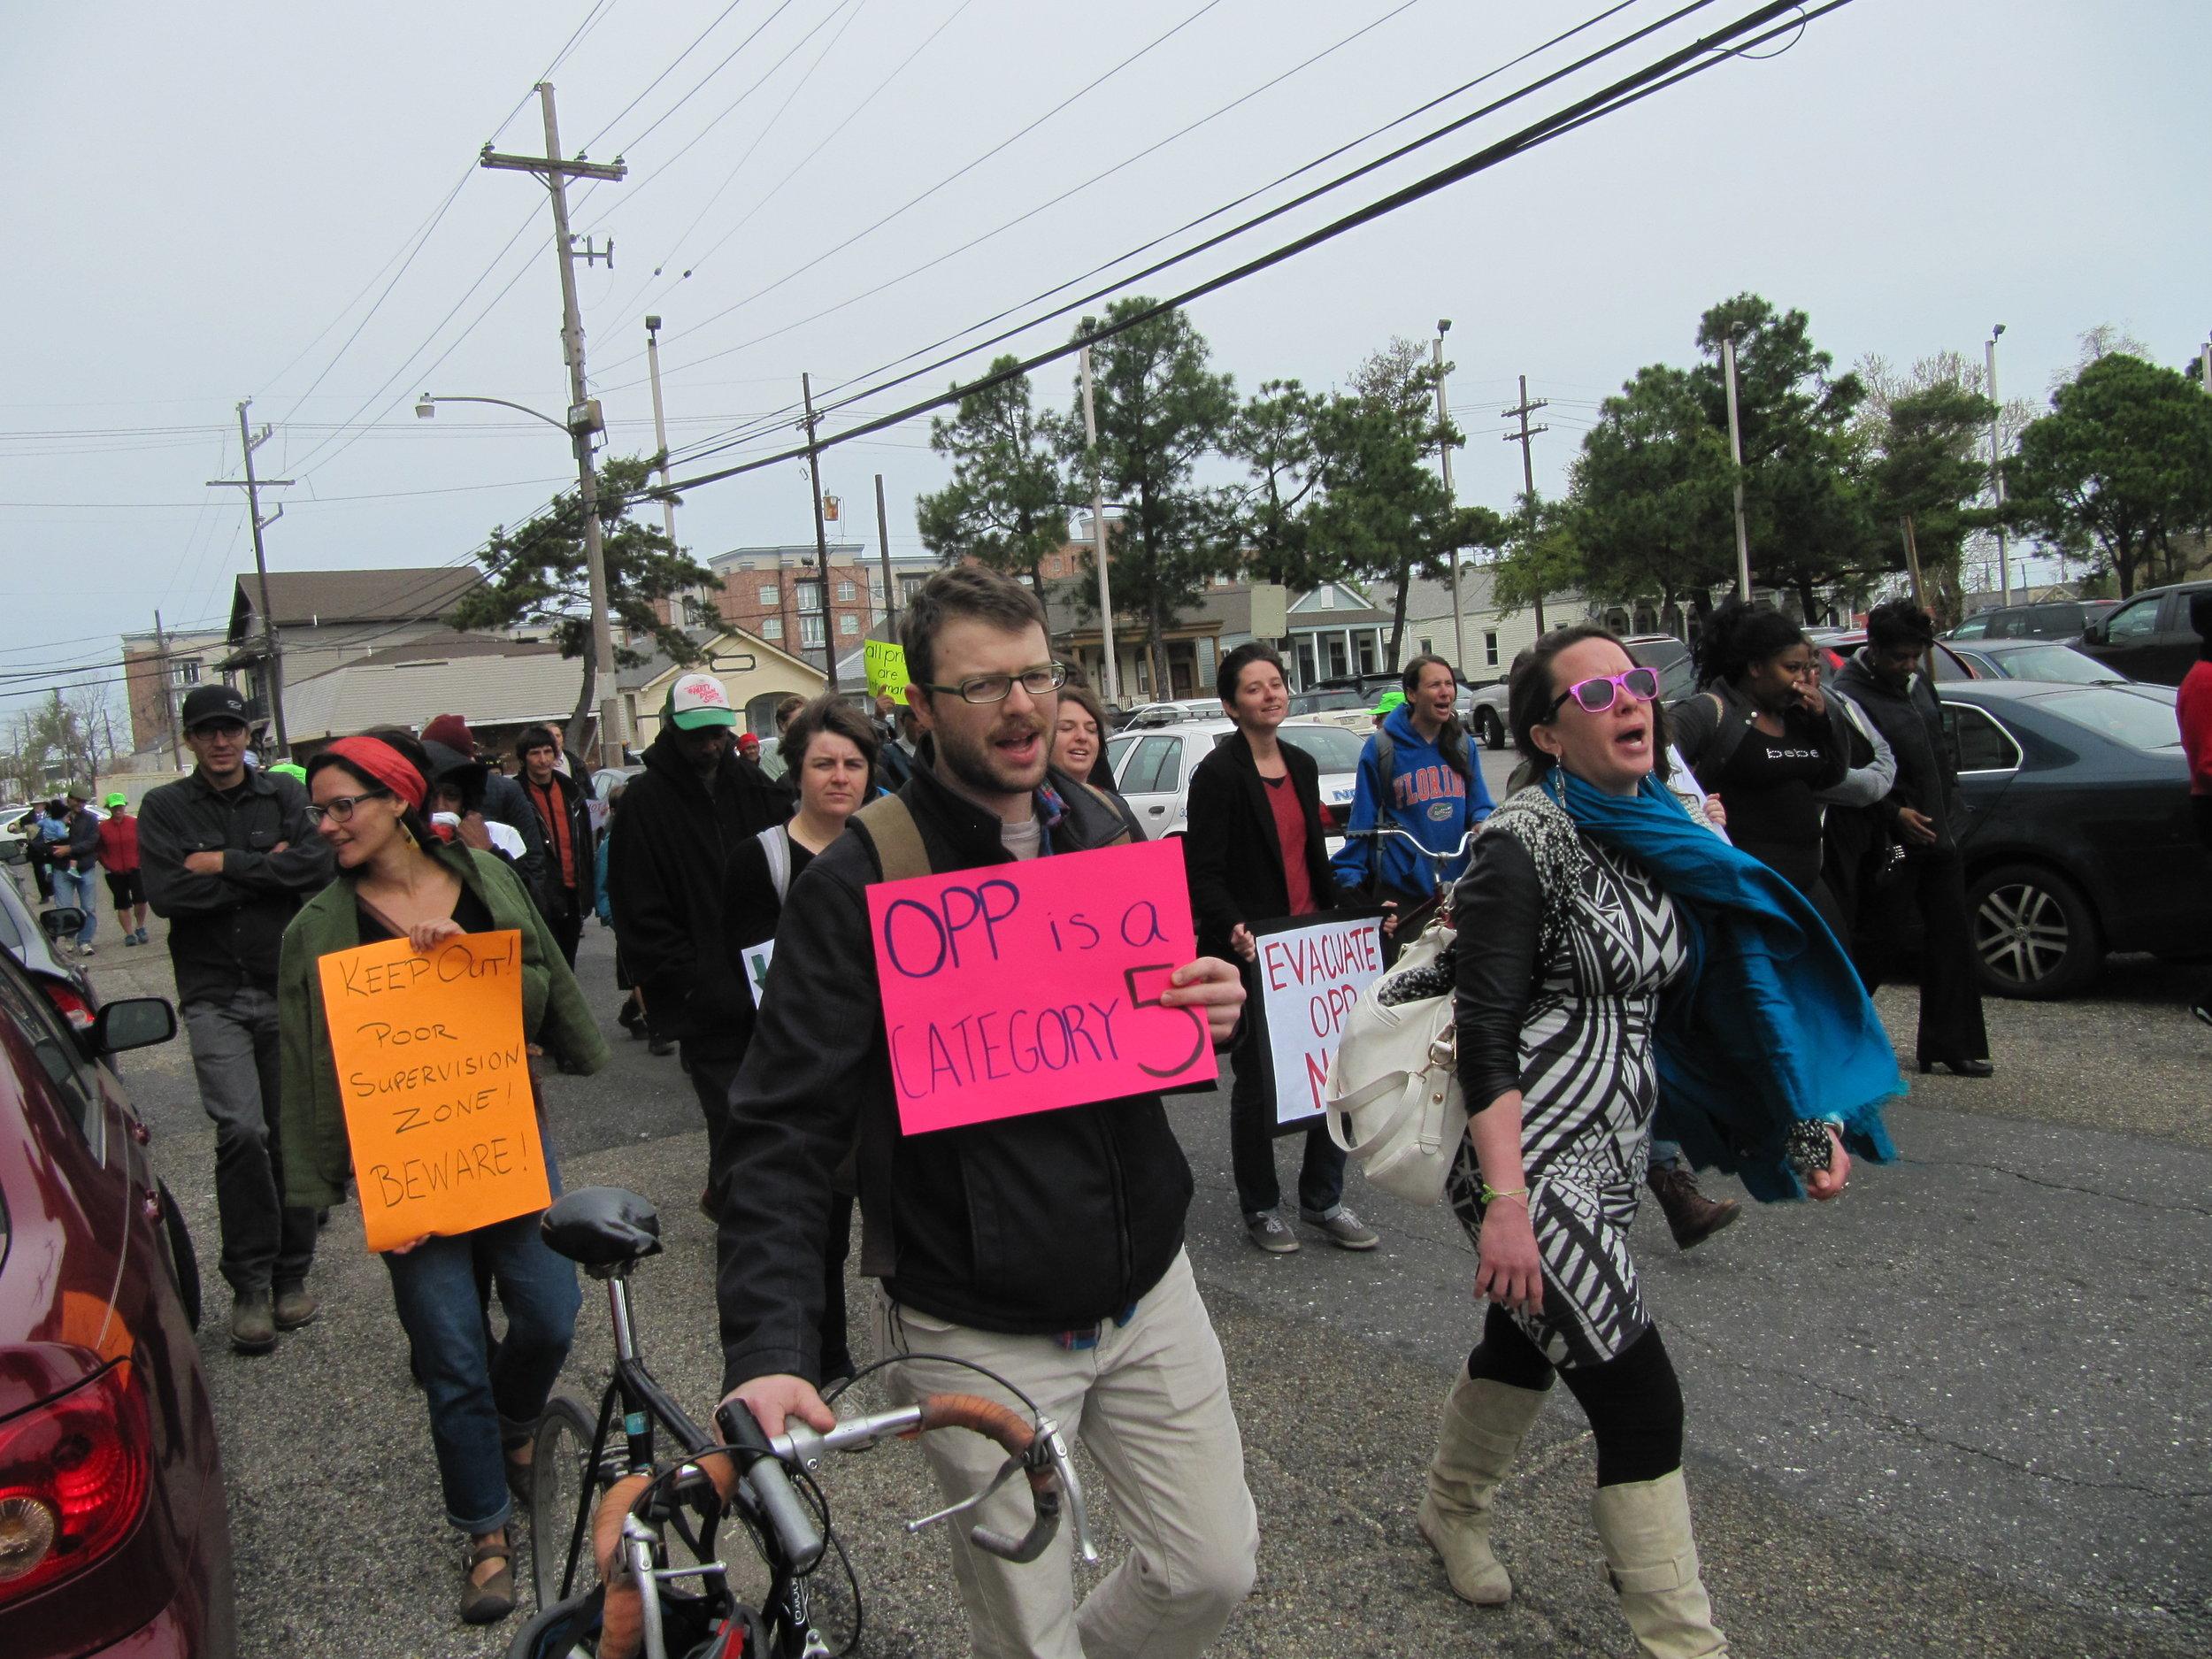 opprc-protest-3-26-14-128-copy.jpg